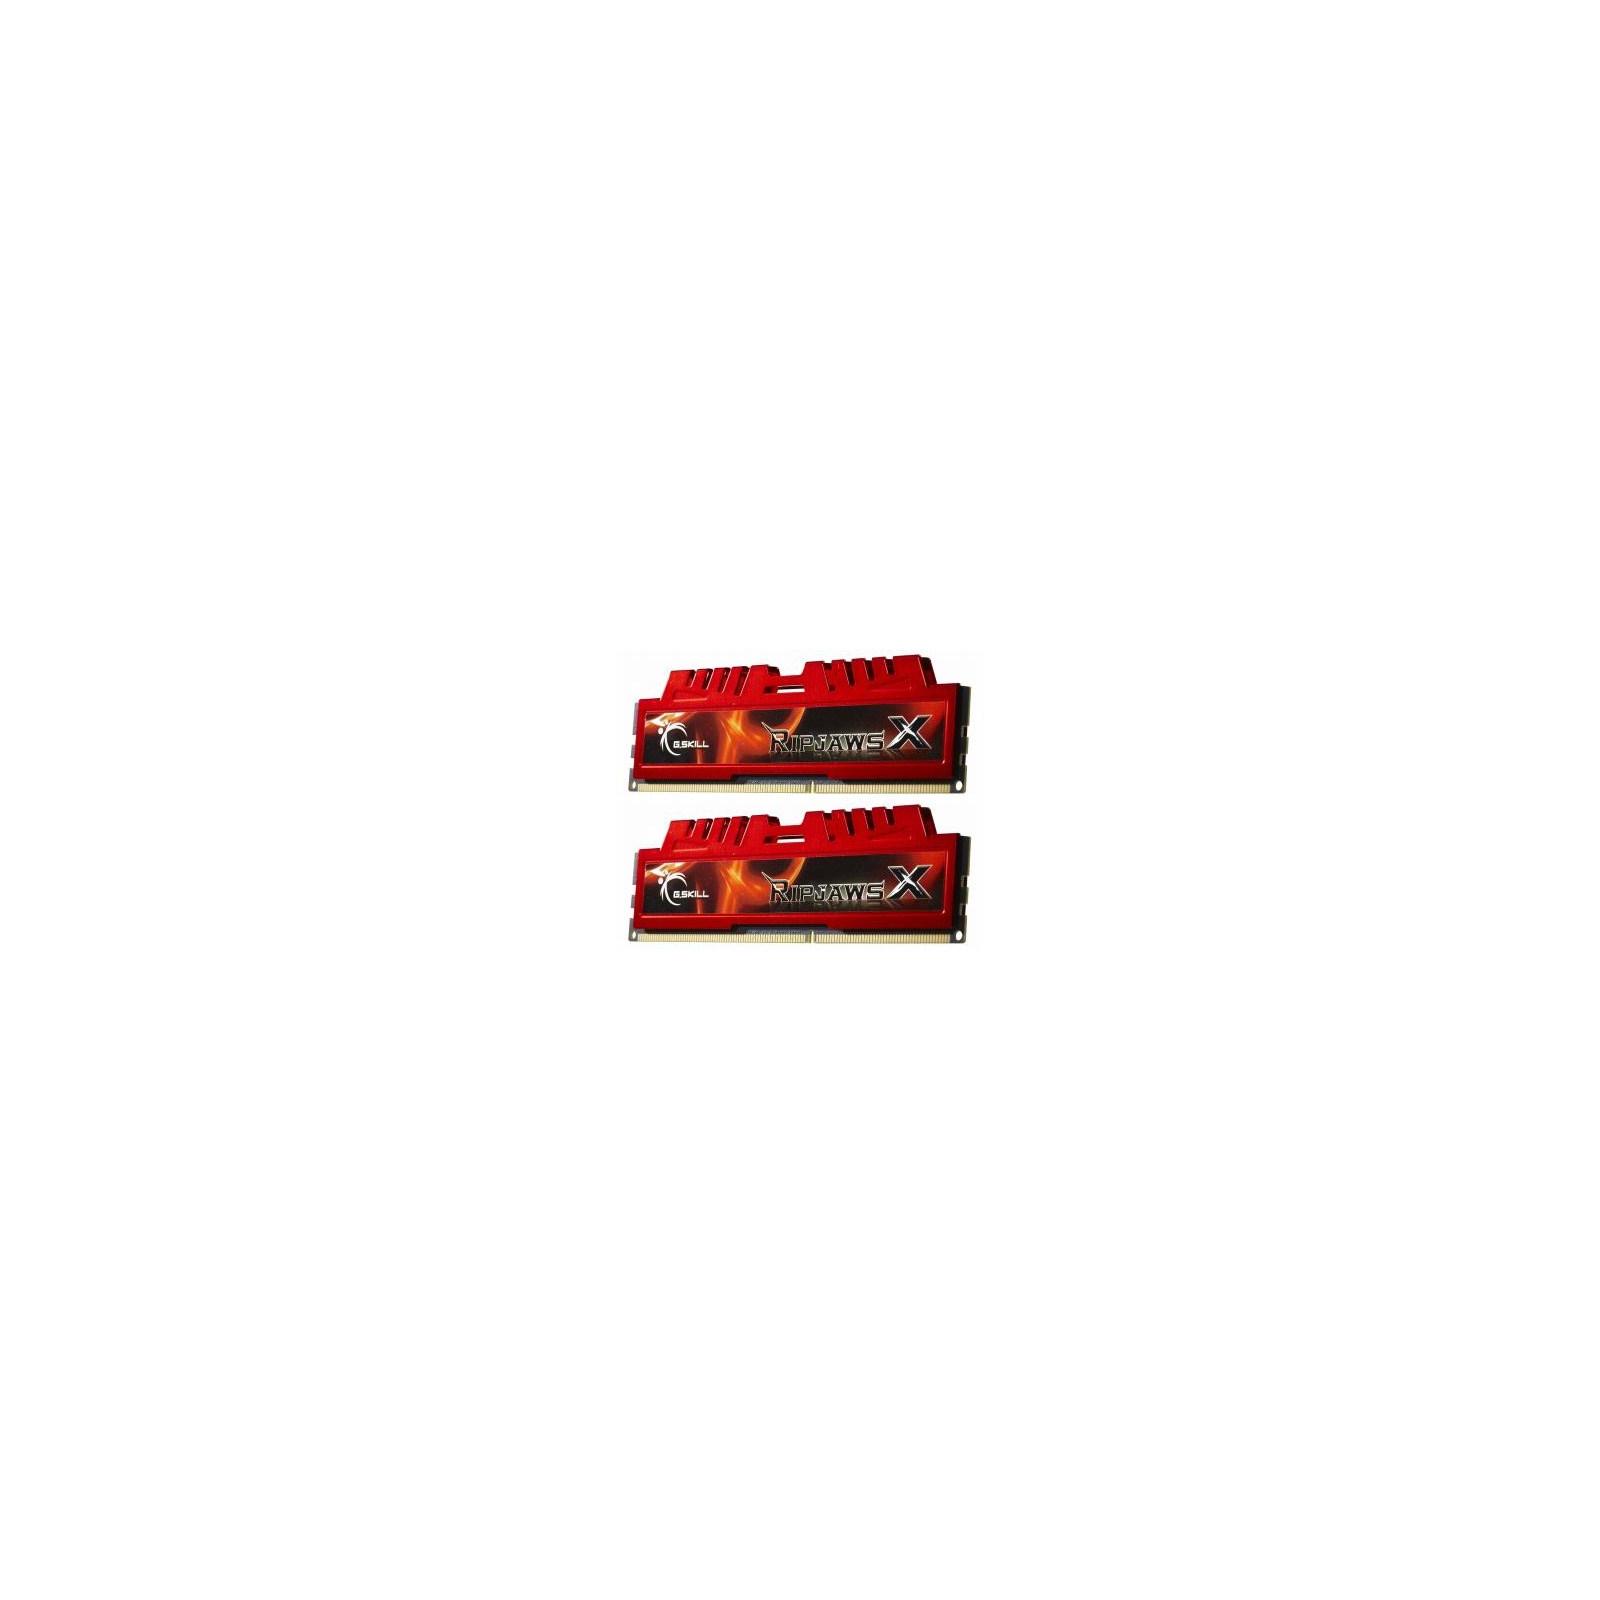 Модуль памяти для компьютера DDR3 4GB (2x2GB) 1600 MHz G.Skill (F3-12800CL9D-4GBXL)